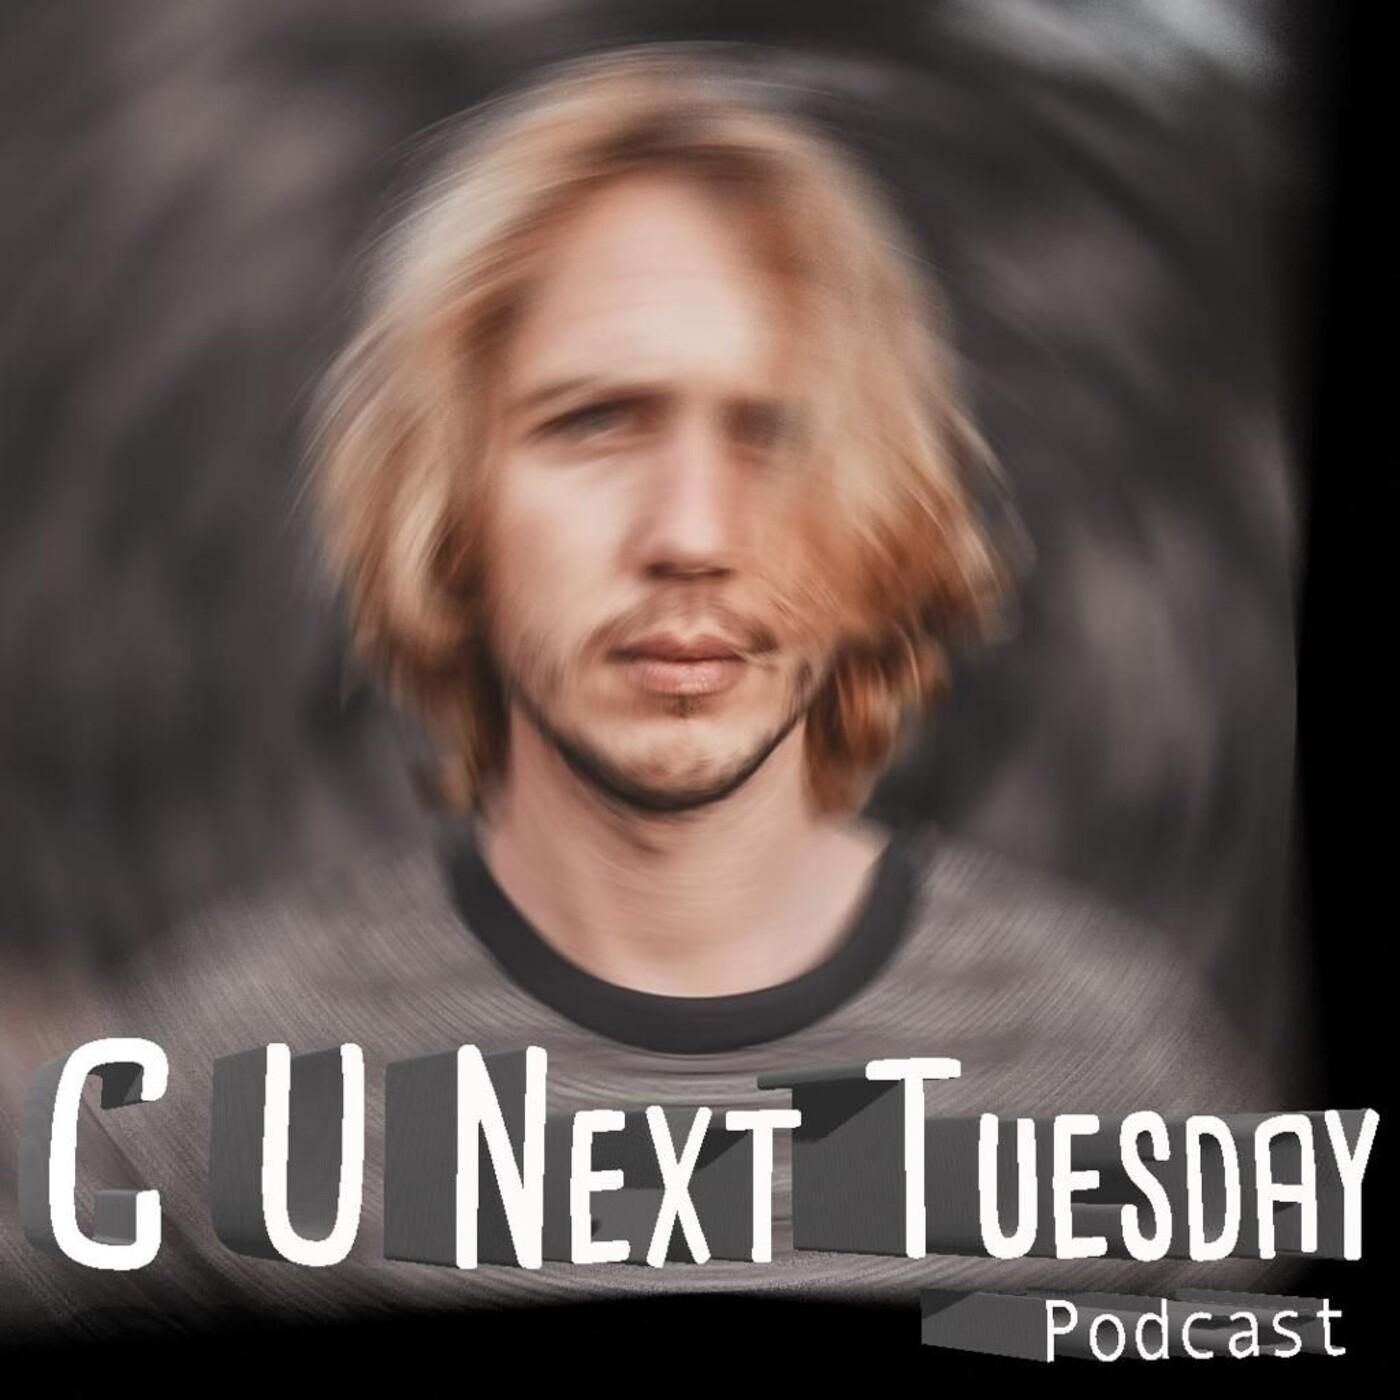 C U Next Tuesday E30 - Jared Green